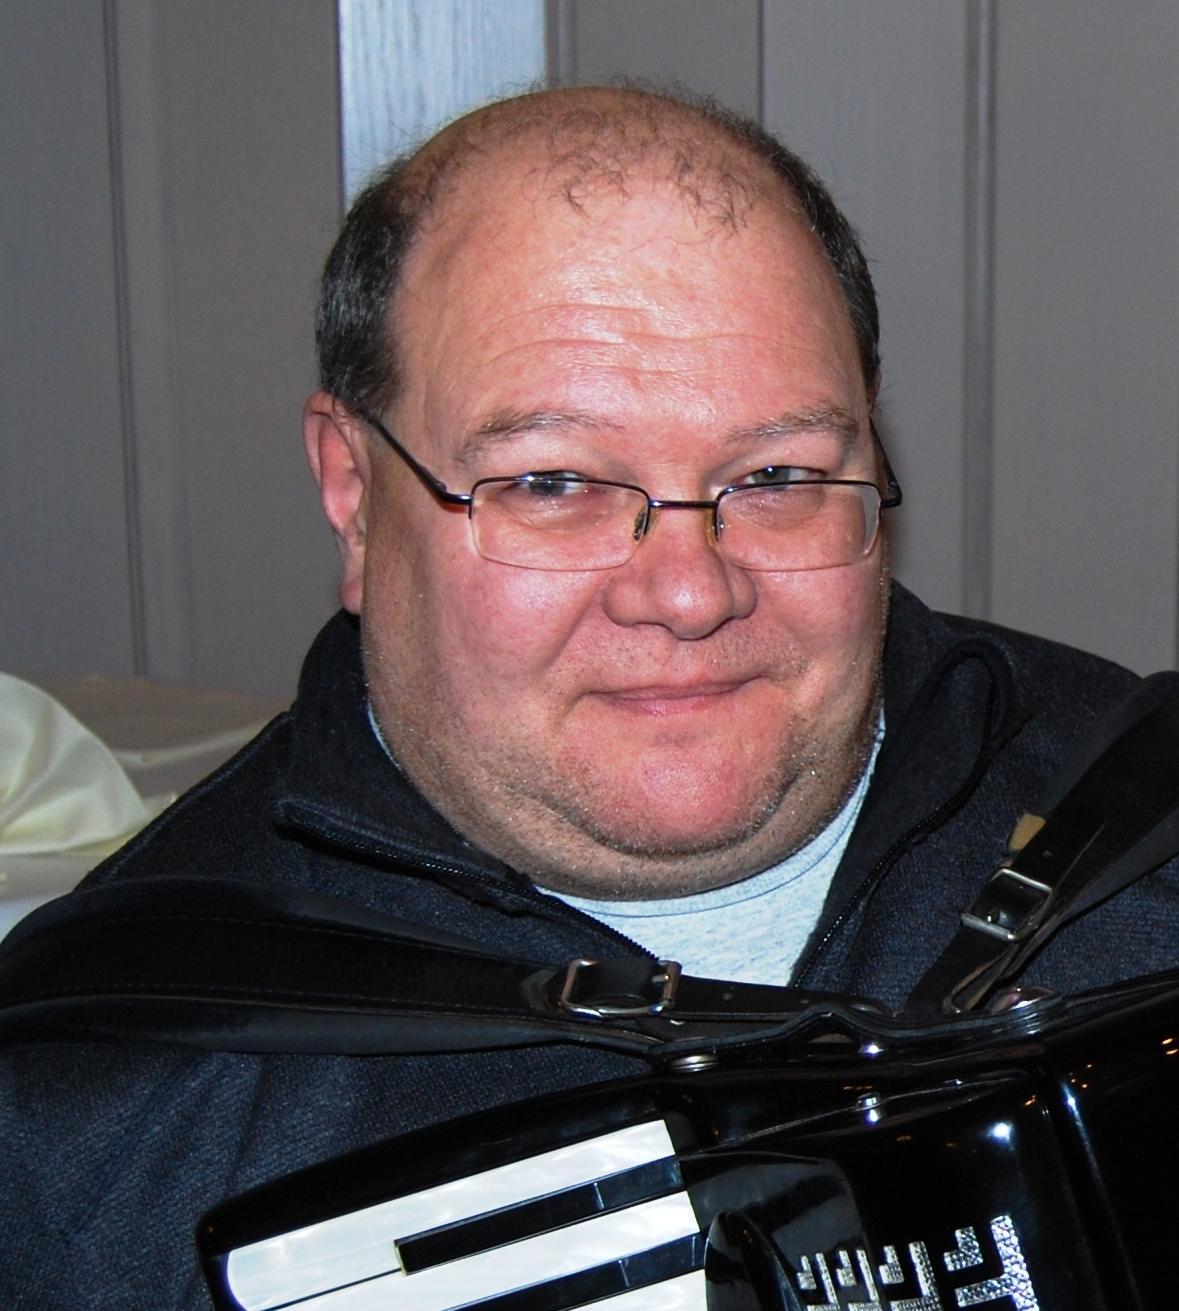 Waldemar Beresowski